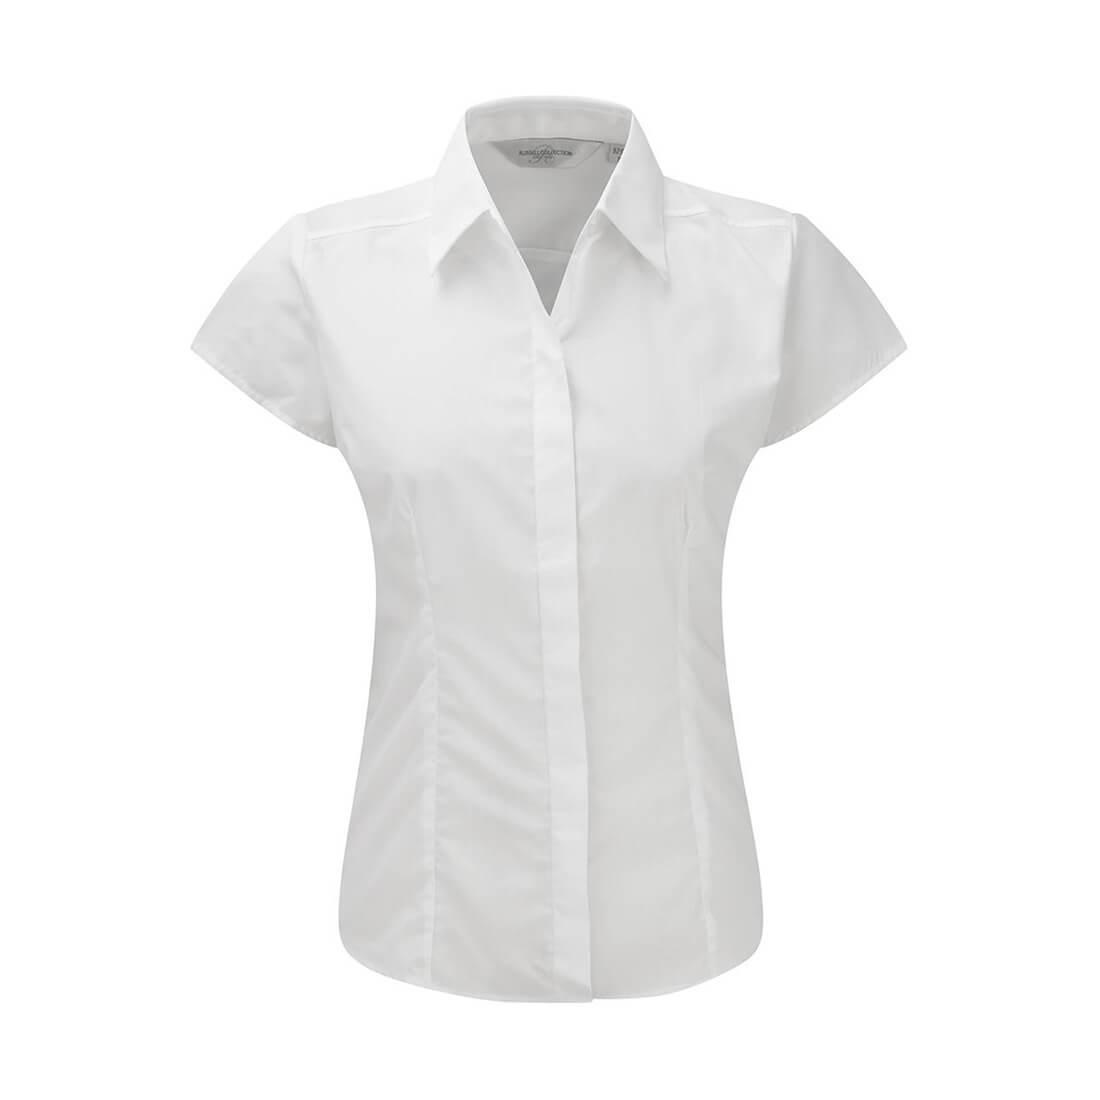 Camasa Poplin MS - Imbracaminte de protectie